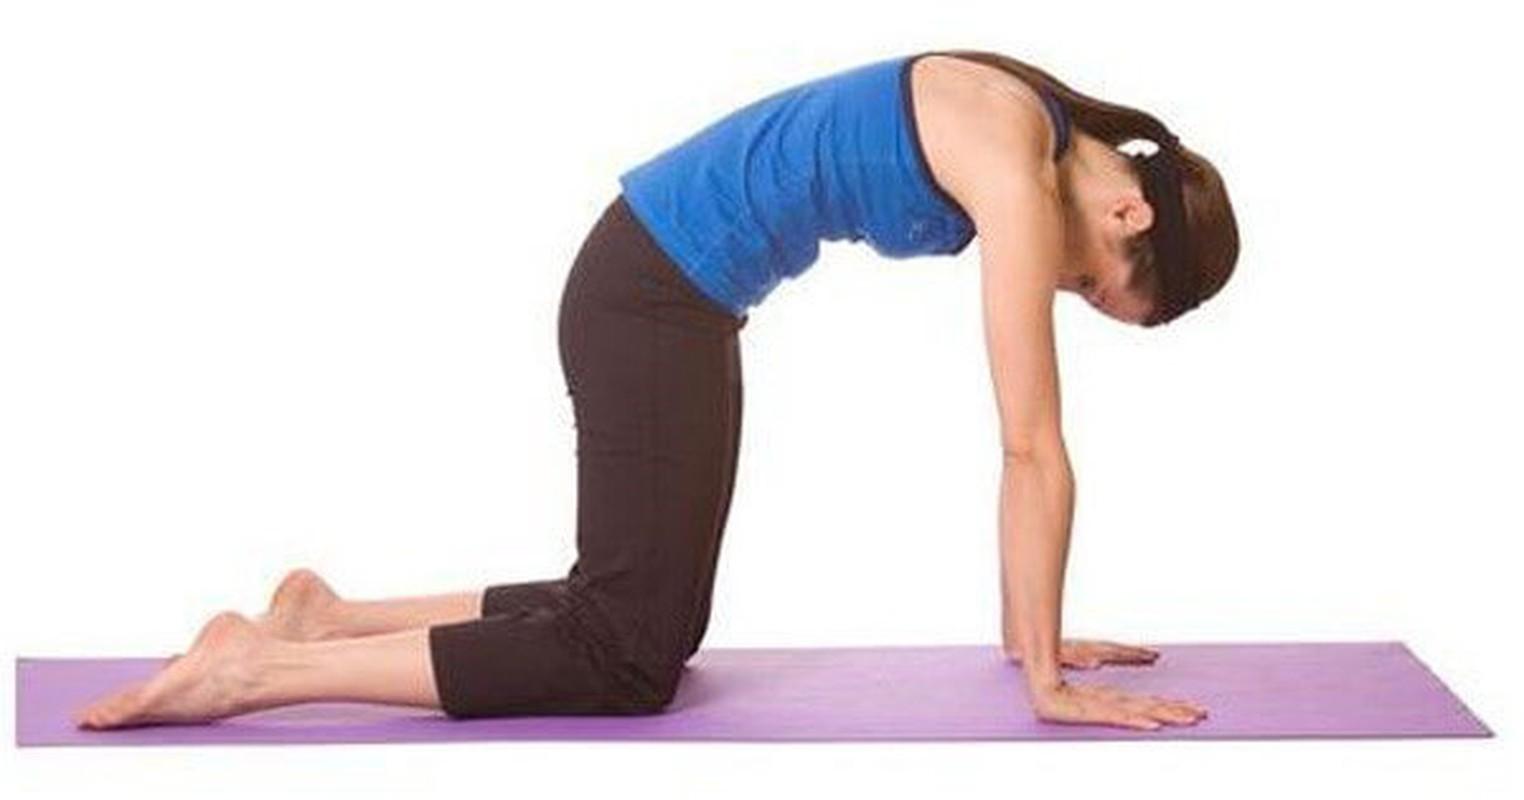 Thuc hanh deu dan 3 bai tap yoga nay cuc tot cho he tieu hoa-Hinh-7